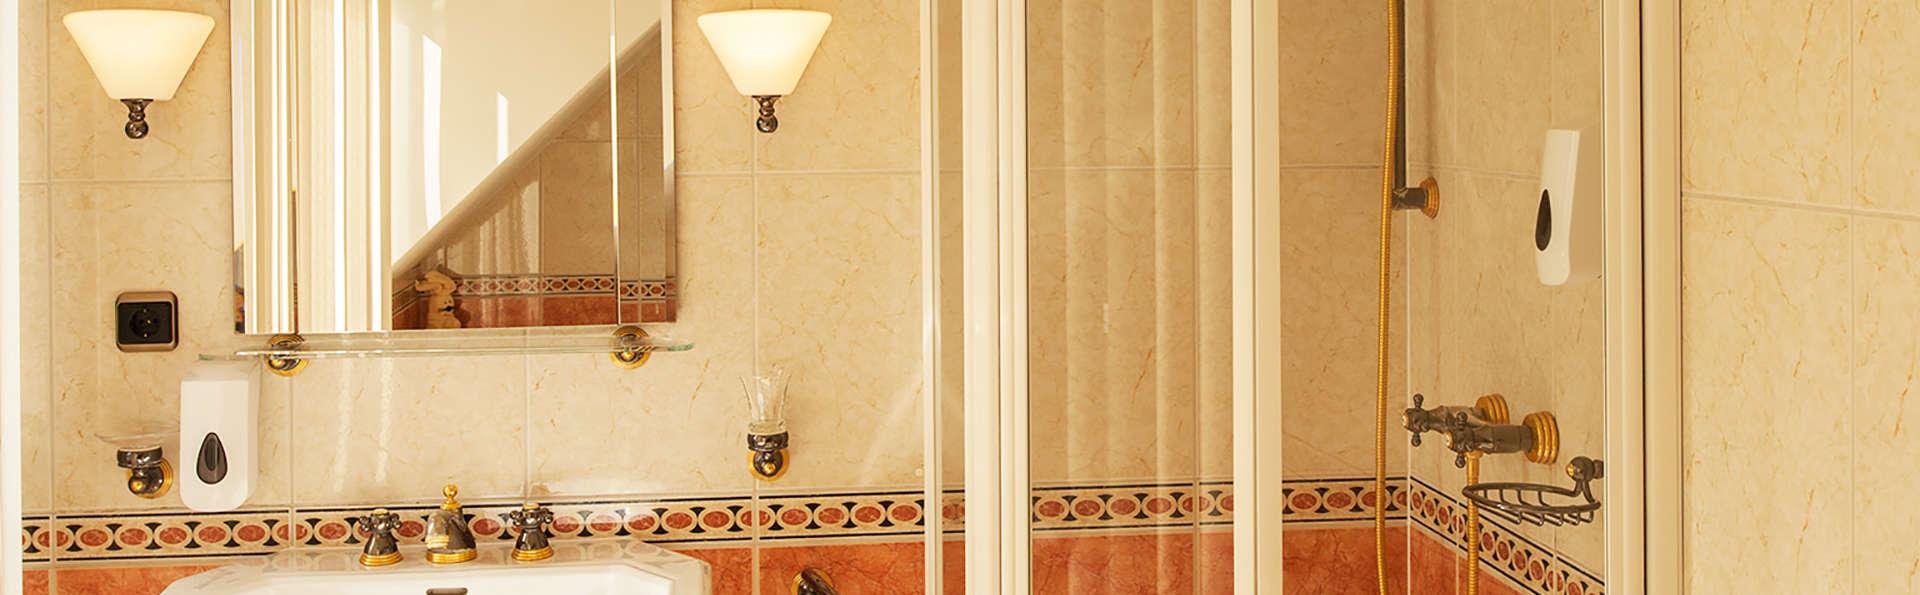 Hotel de Loenermark - Edit_Bathroom.jpg